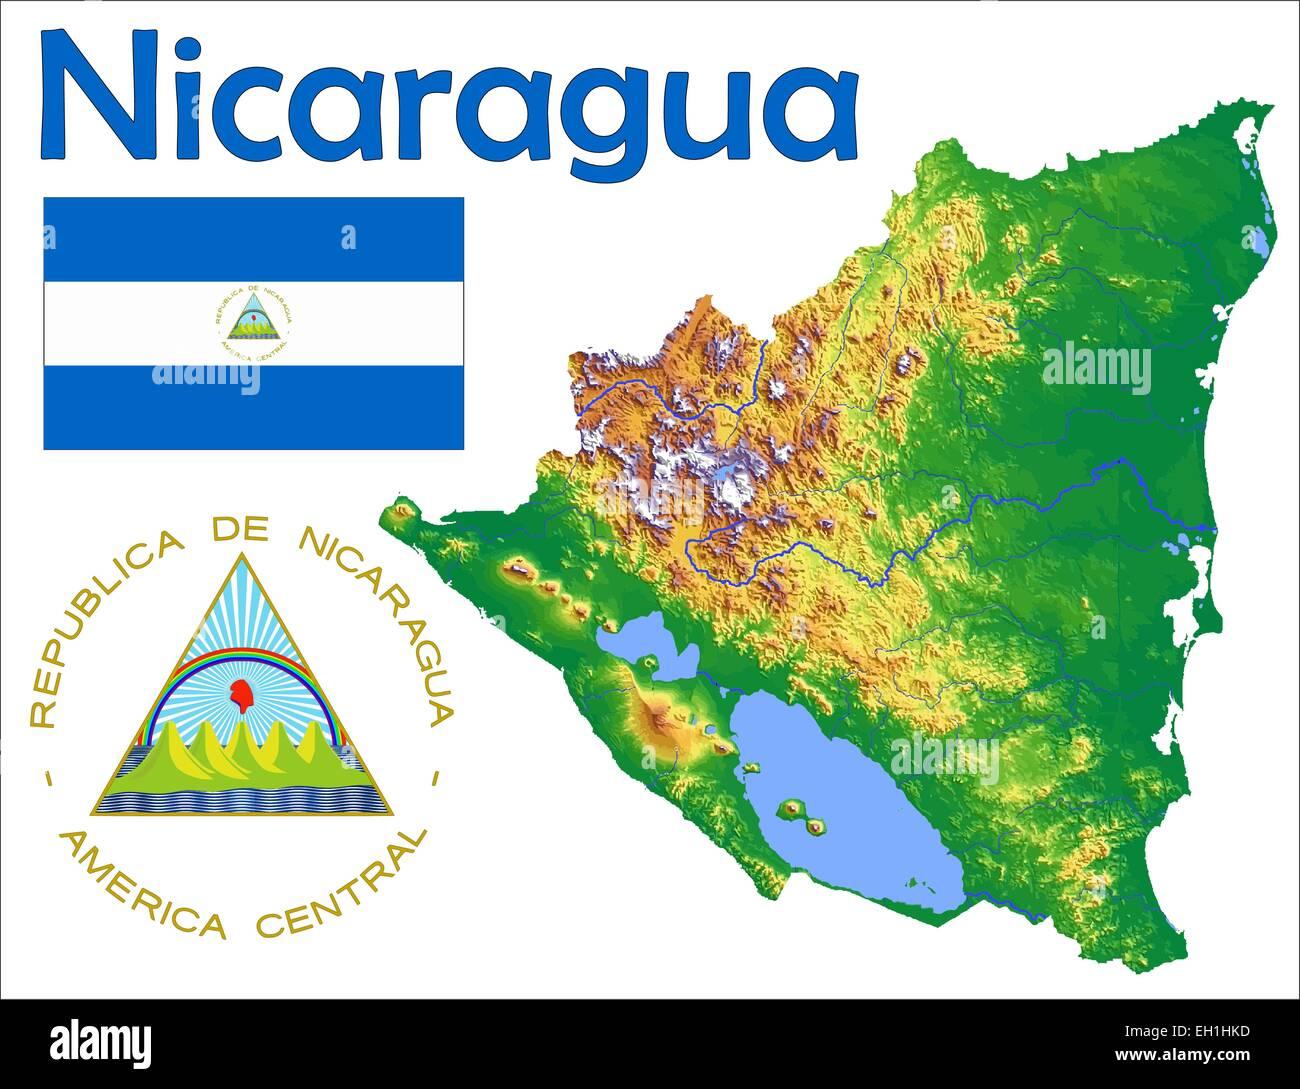 americas map, dominican republic map, russia map, cayman map, peru map, qatar map, guam map, corn islands map, norway map, haiti map, carribean map, india map, cuba map, romania map, sri lanka map, honduras map, panama map, mexico map, puerto rico map, costa rica map, on map nicaragua